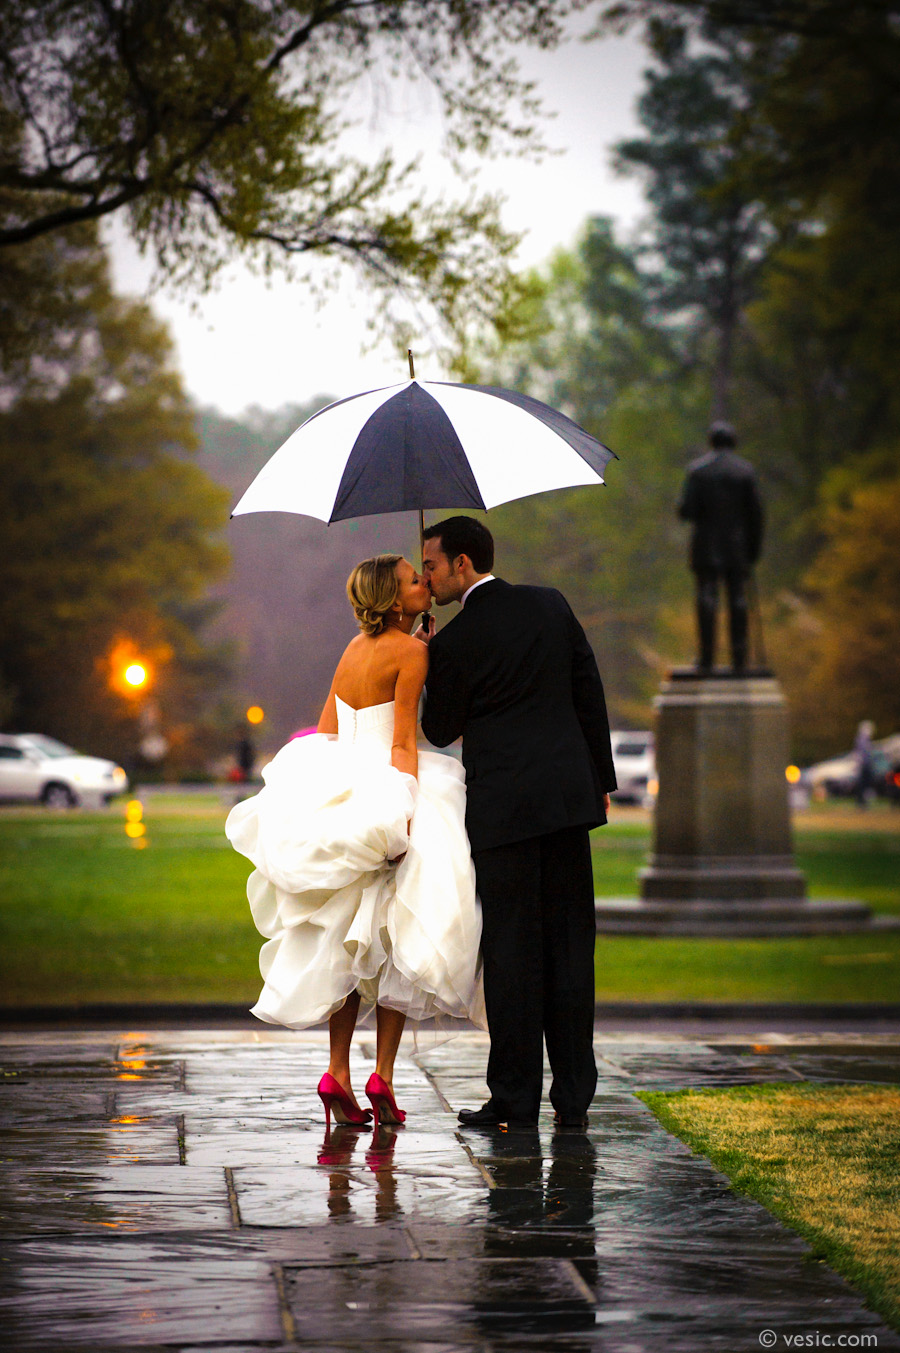 Rain on your wedding day creates amazing photos rain on your wedding day junglespirit Image collections